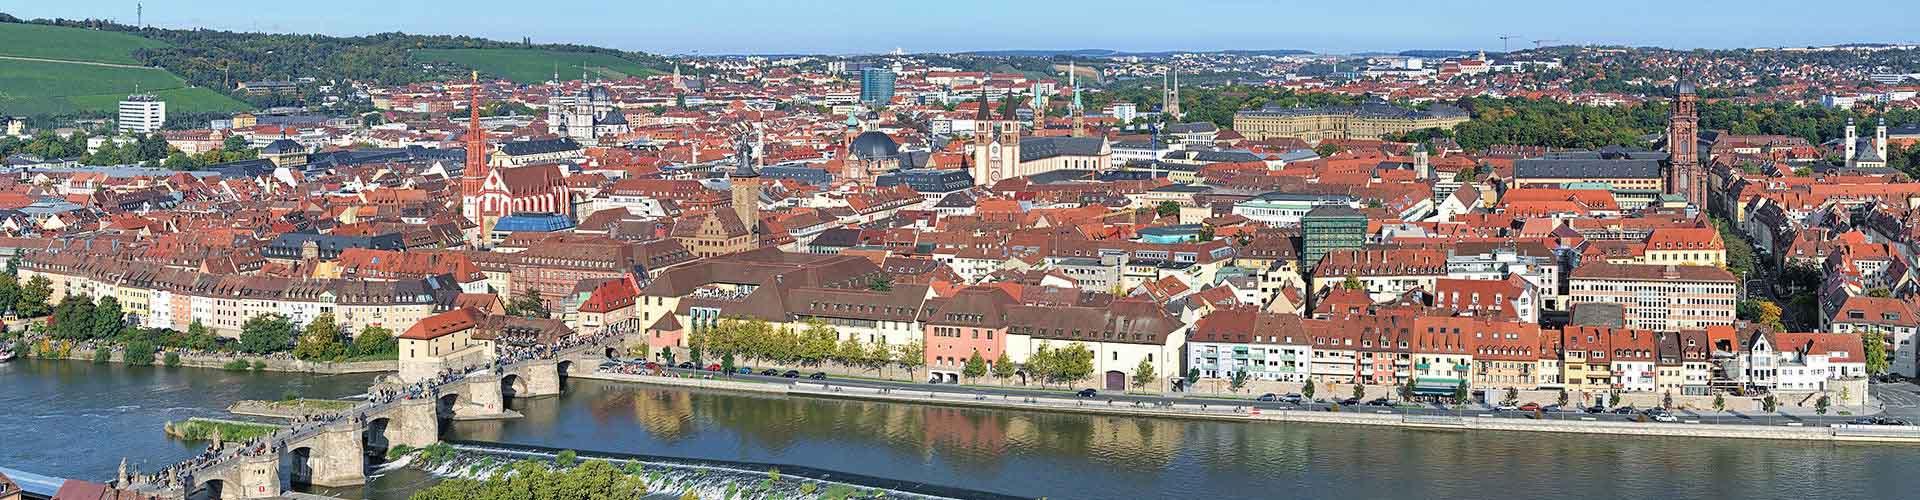 Wuerzburg - Hostales en Wuerzburg. Mapas de Wuerzburg, Fotos y comentarios de cada Hostal en Wuerzburg.